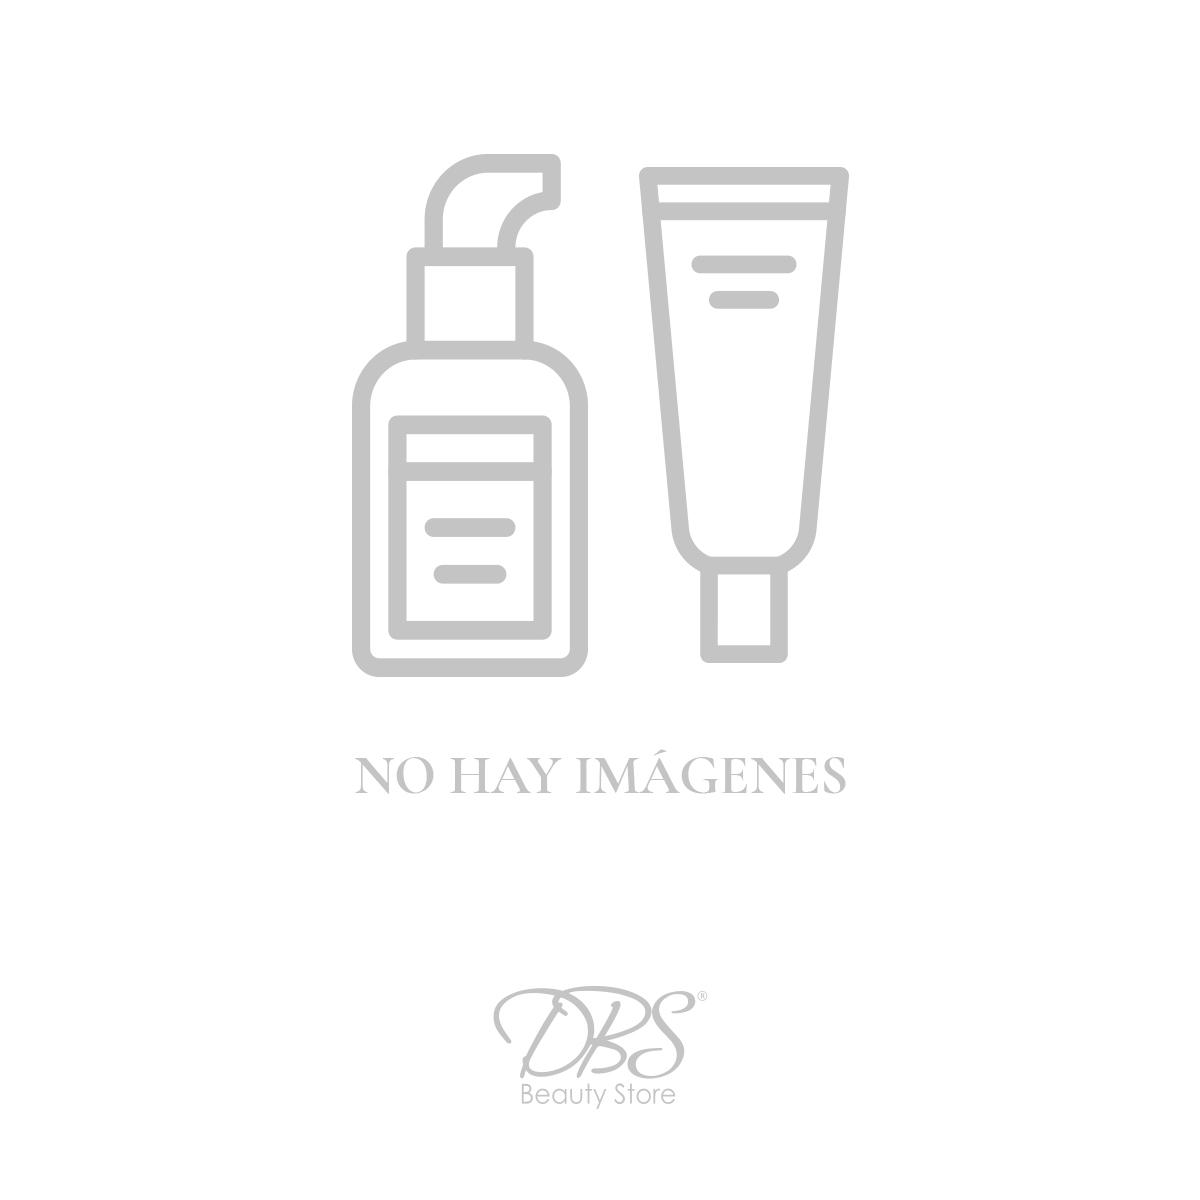 dbs-cosmetics-DBS-YH1030-MP.jpg